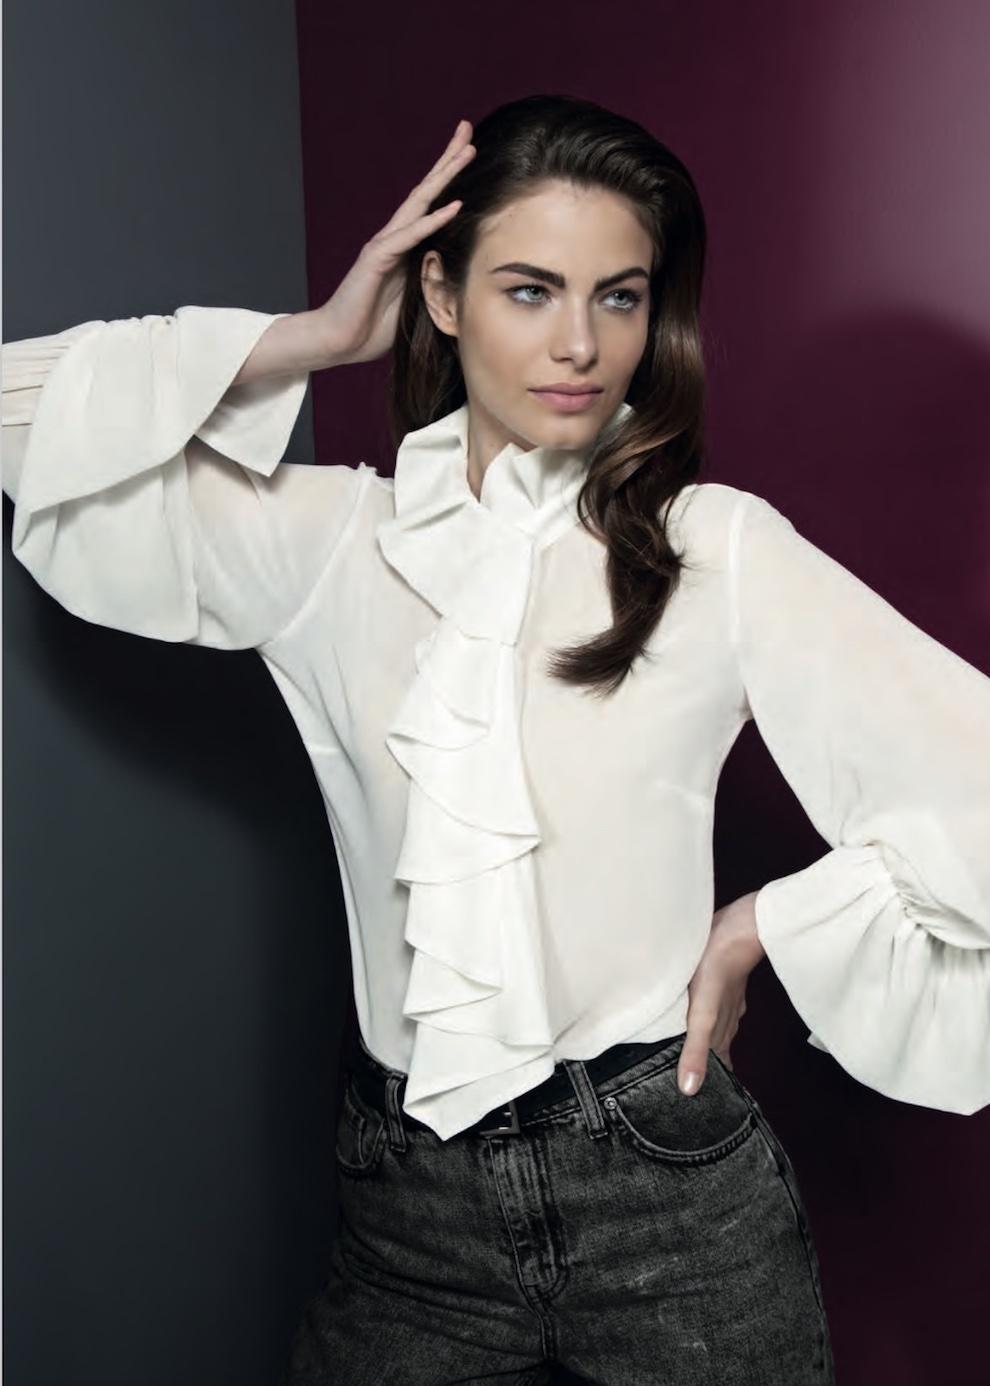 wholesale dealer 82412 51ff9 Nara camicie donna uomo autunno inverno 2018-2019 Catalogo ...